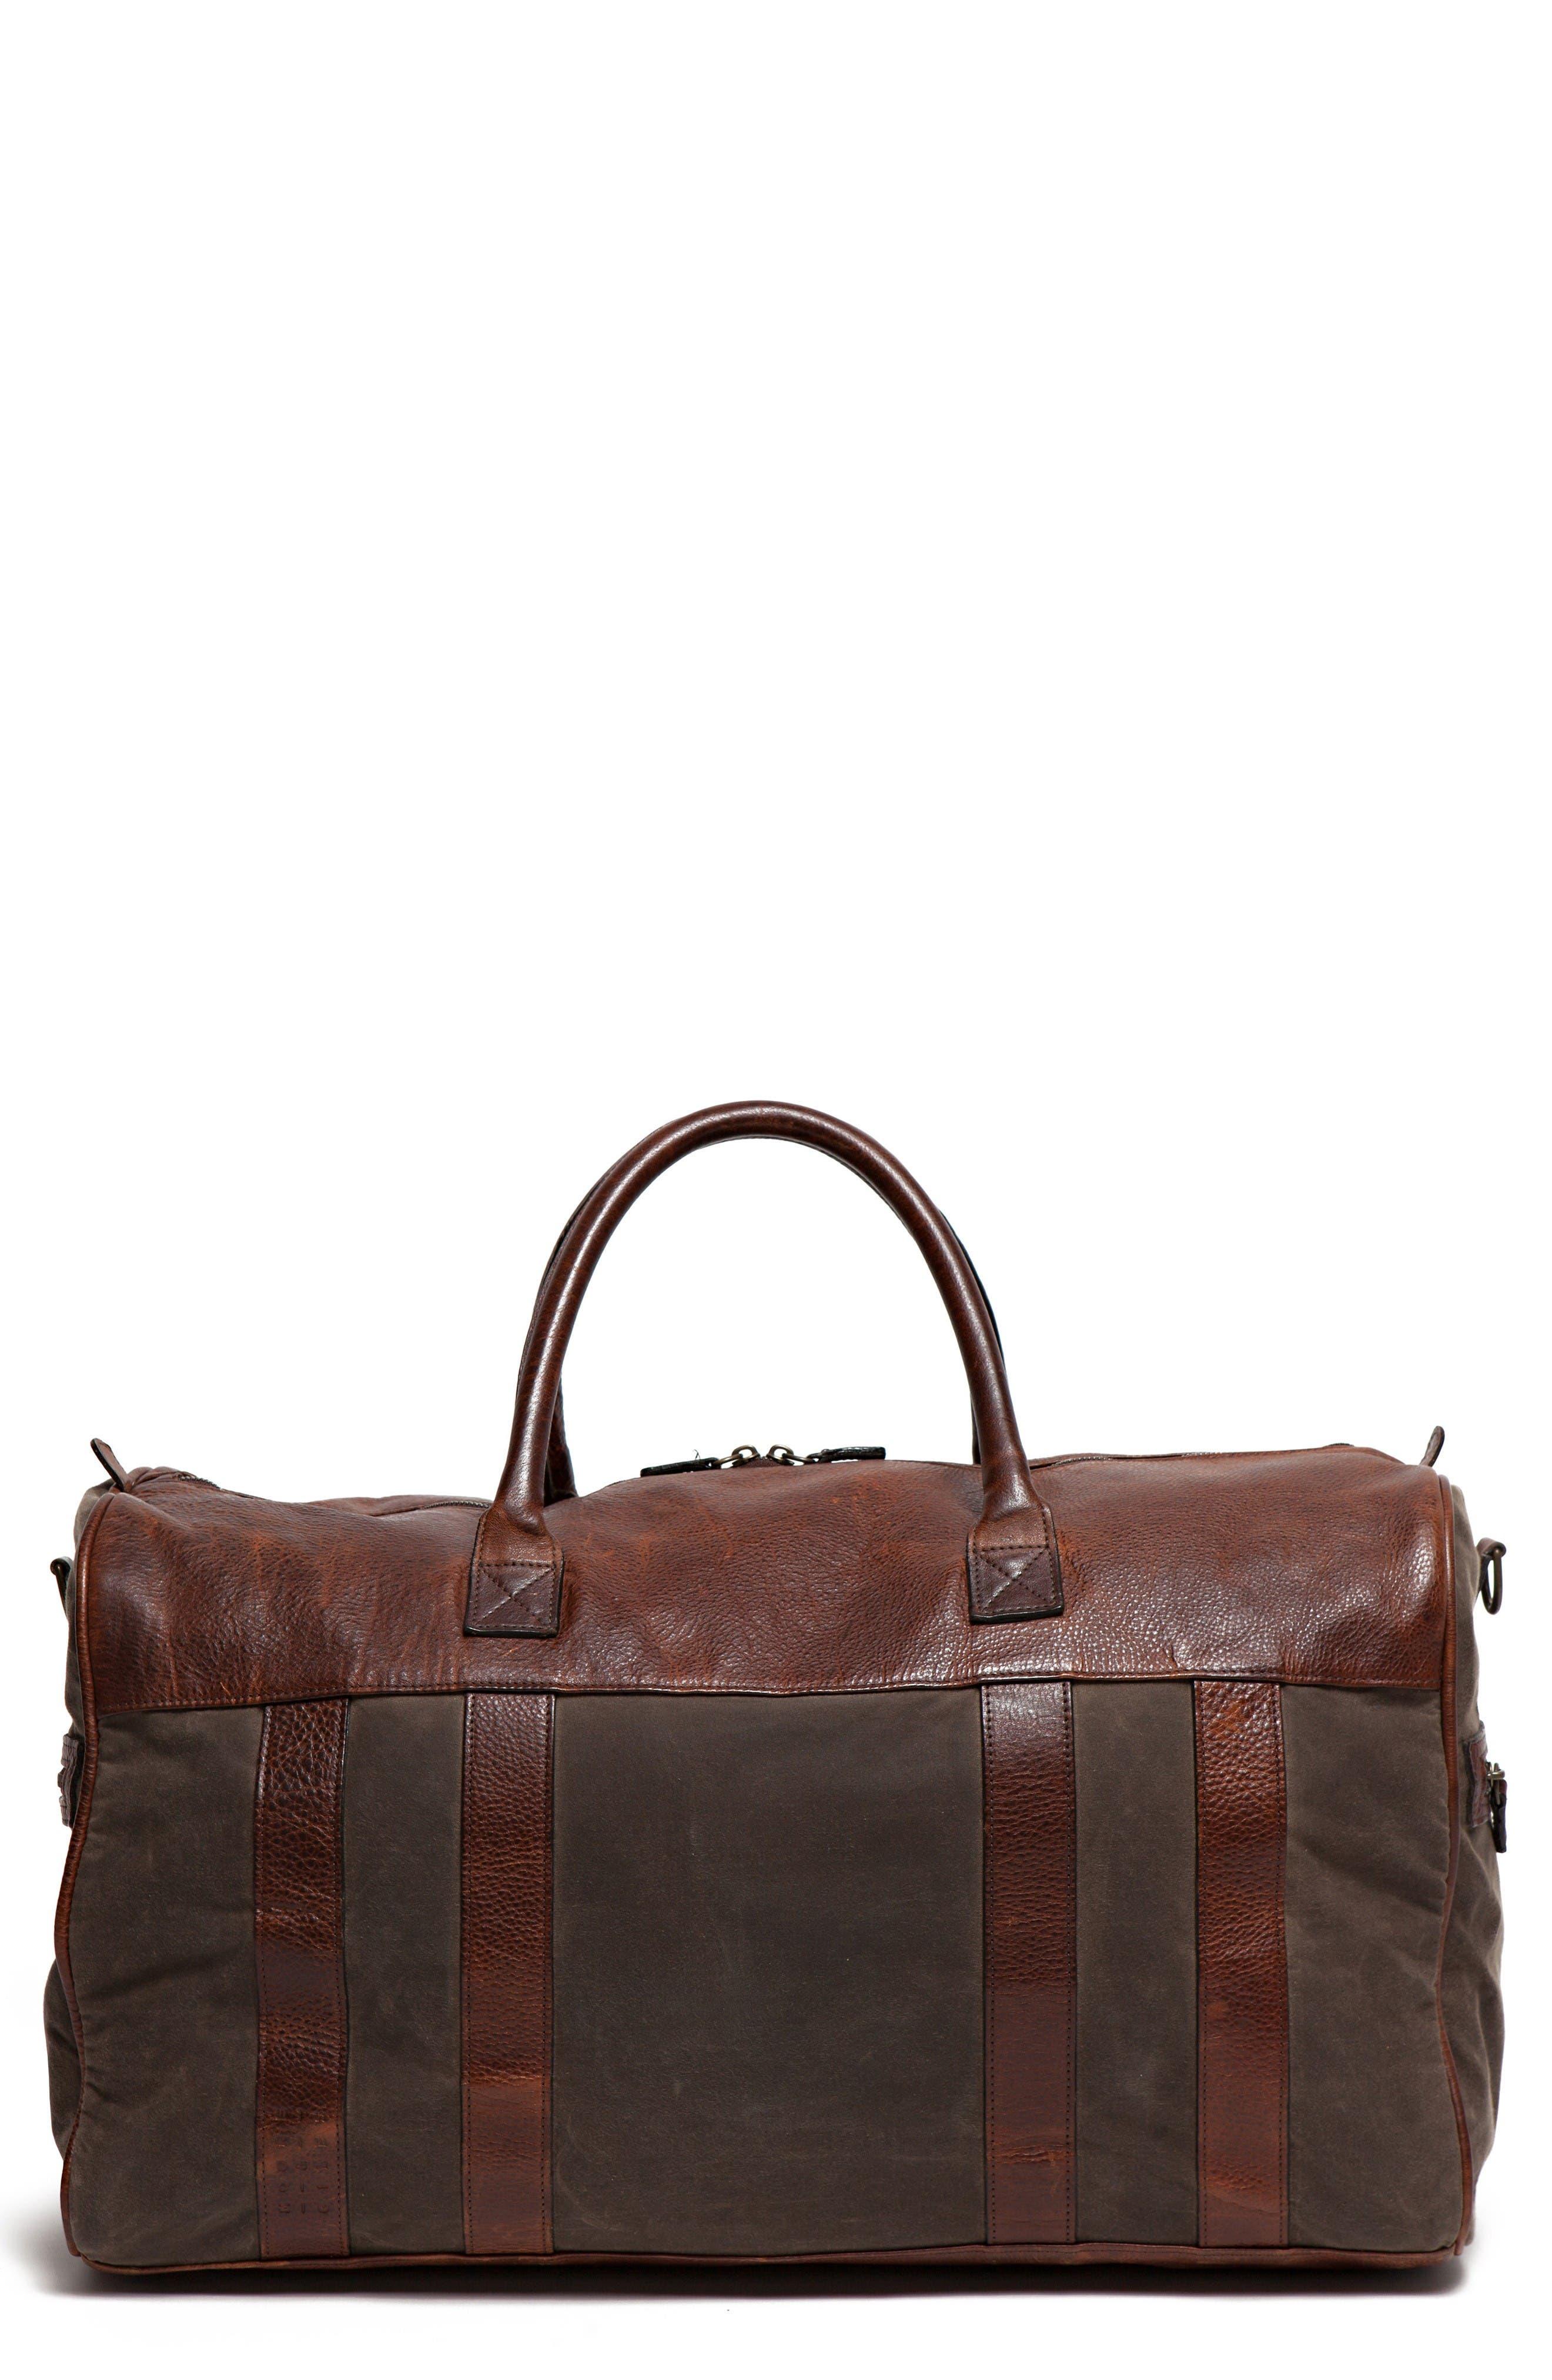 Moore & Giles Cleland XL Duffel Bag